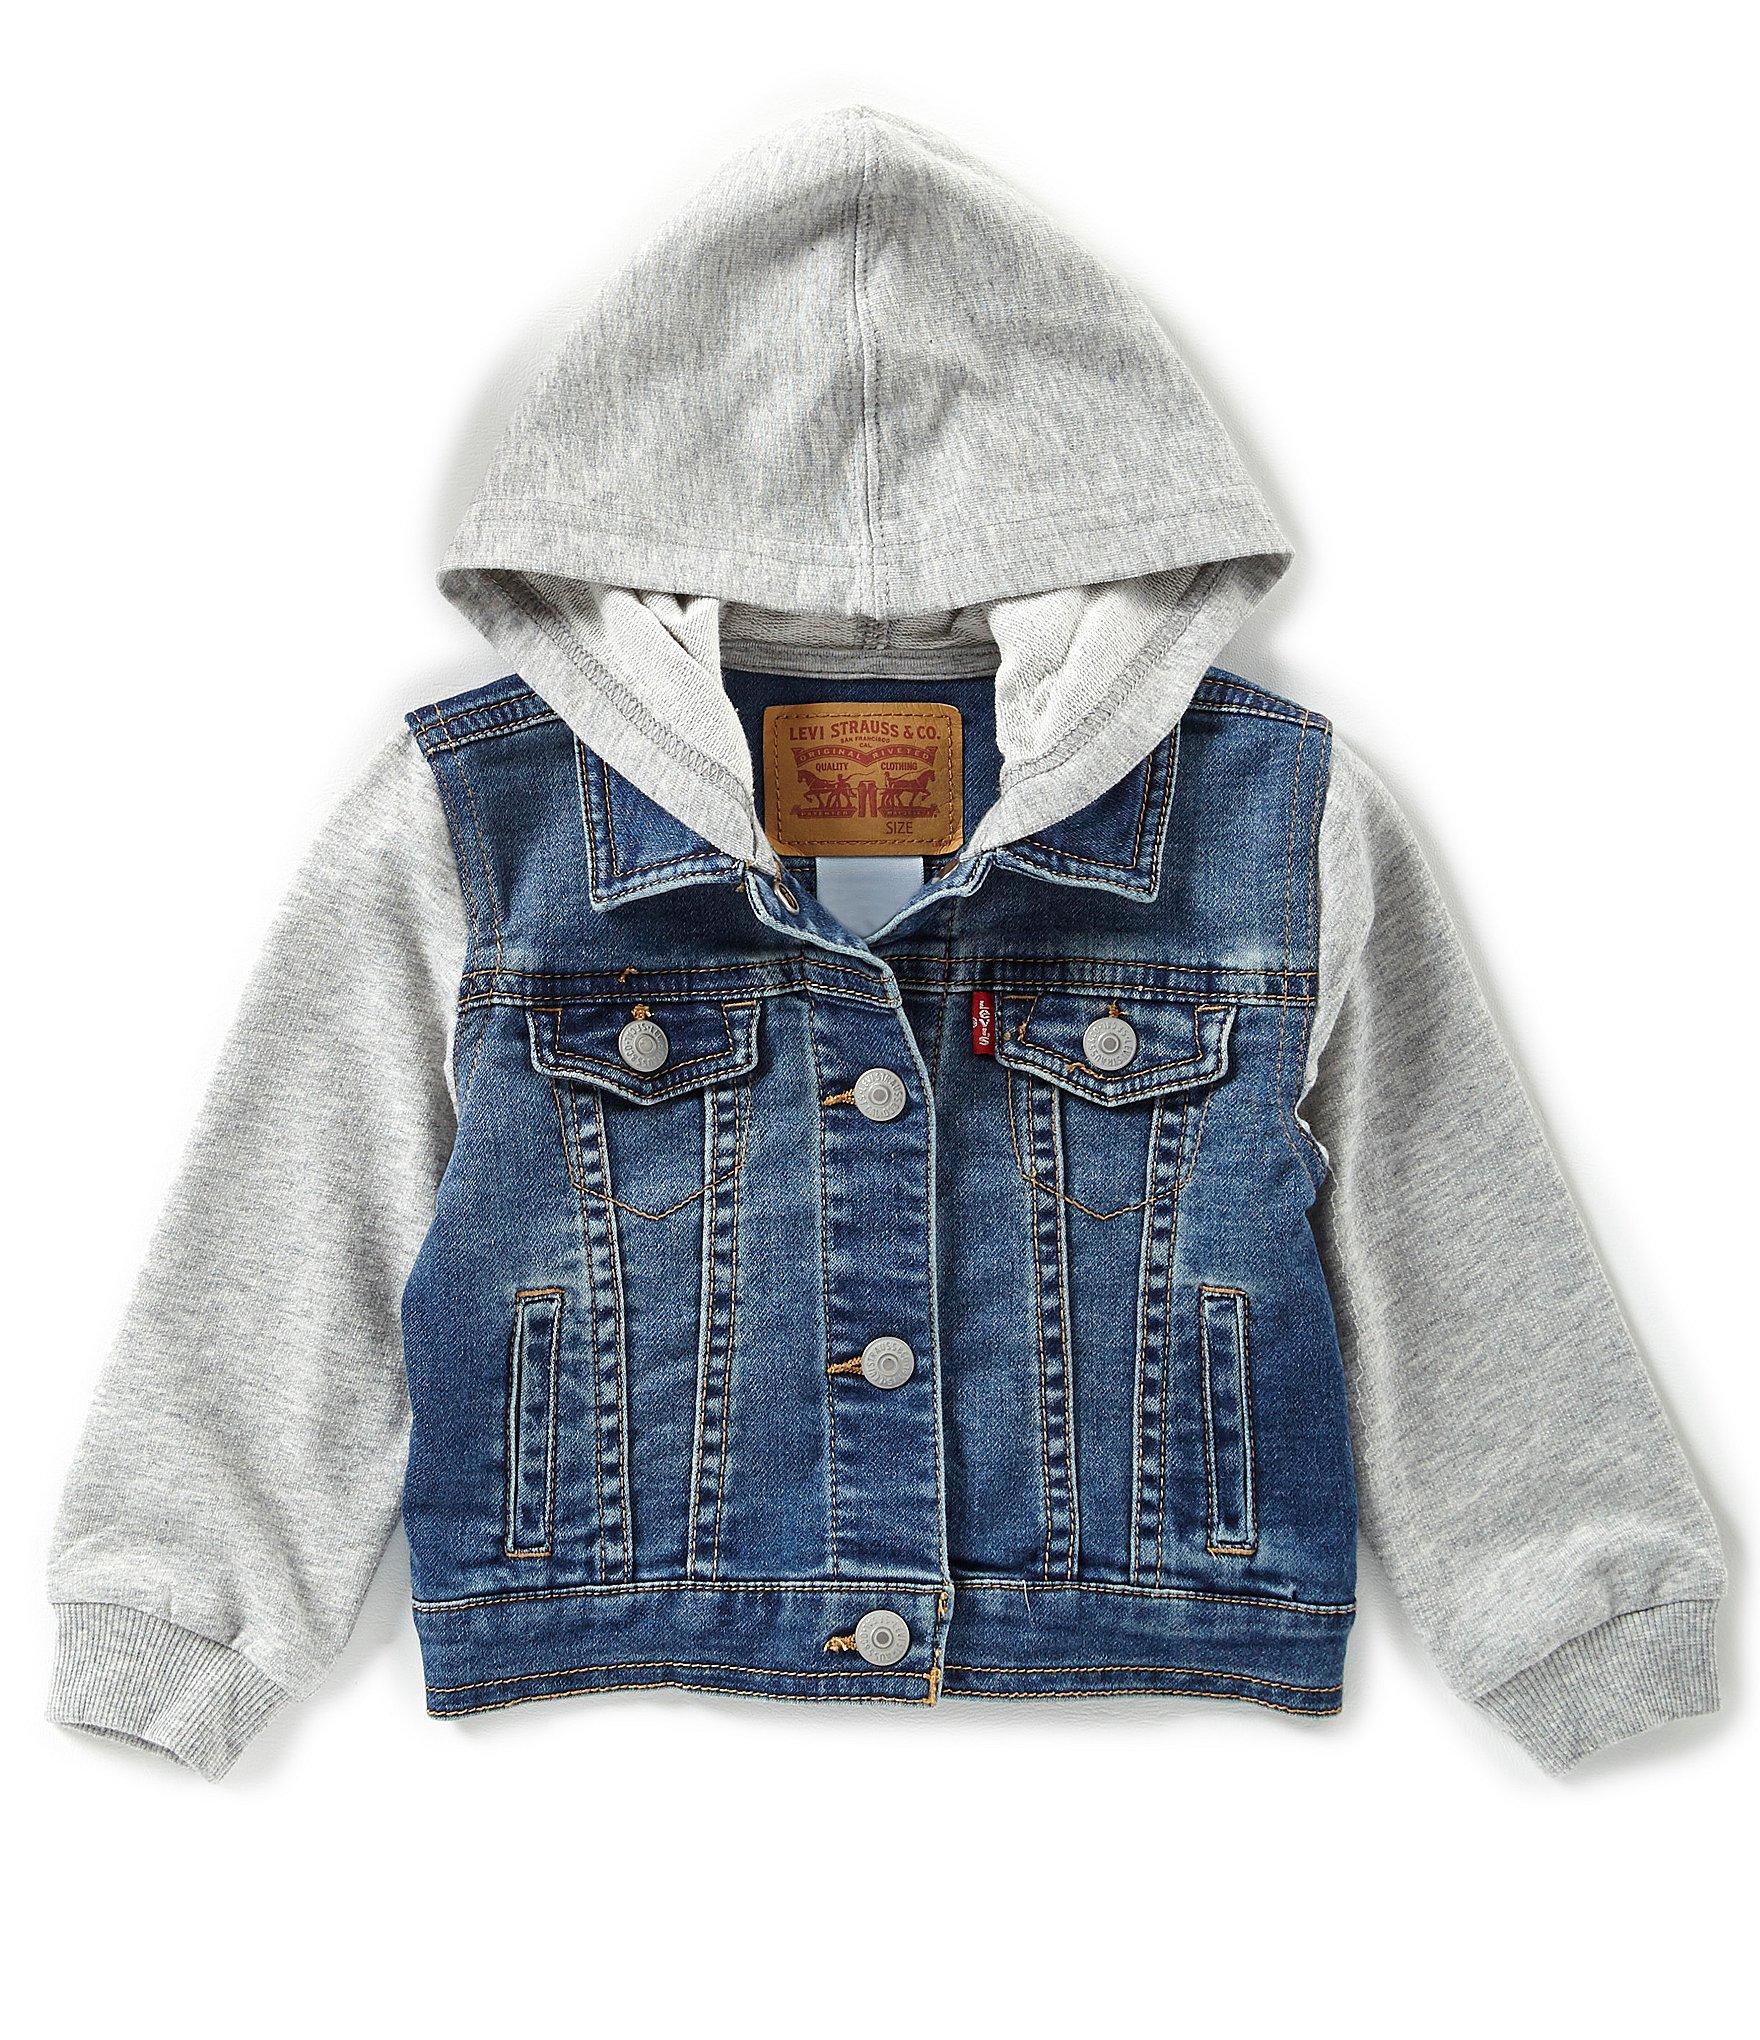 f583813600ed Levis Baby Boys Clothing